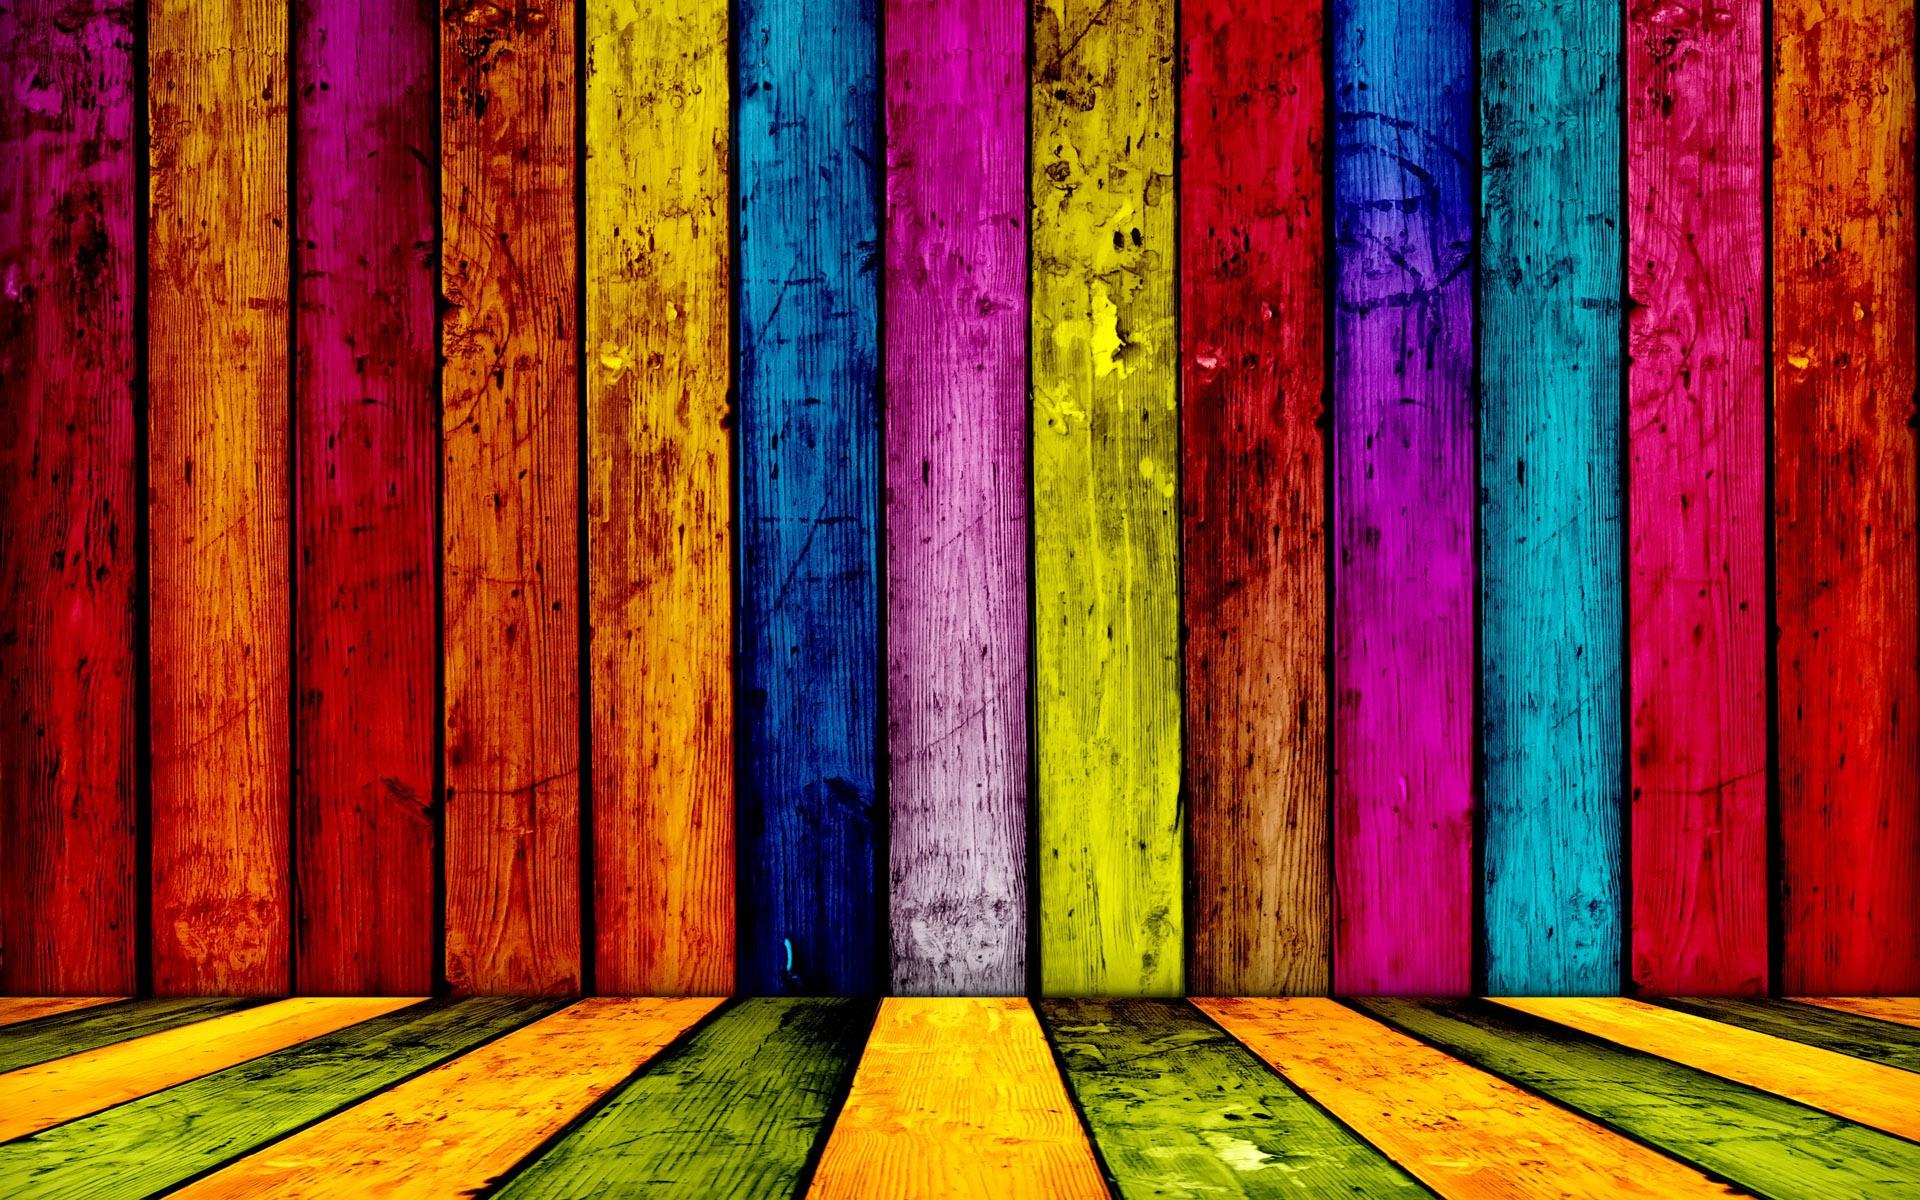 Fondos de pantalla abstracta de colores de madera for Fondos de pantalla full hd colores